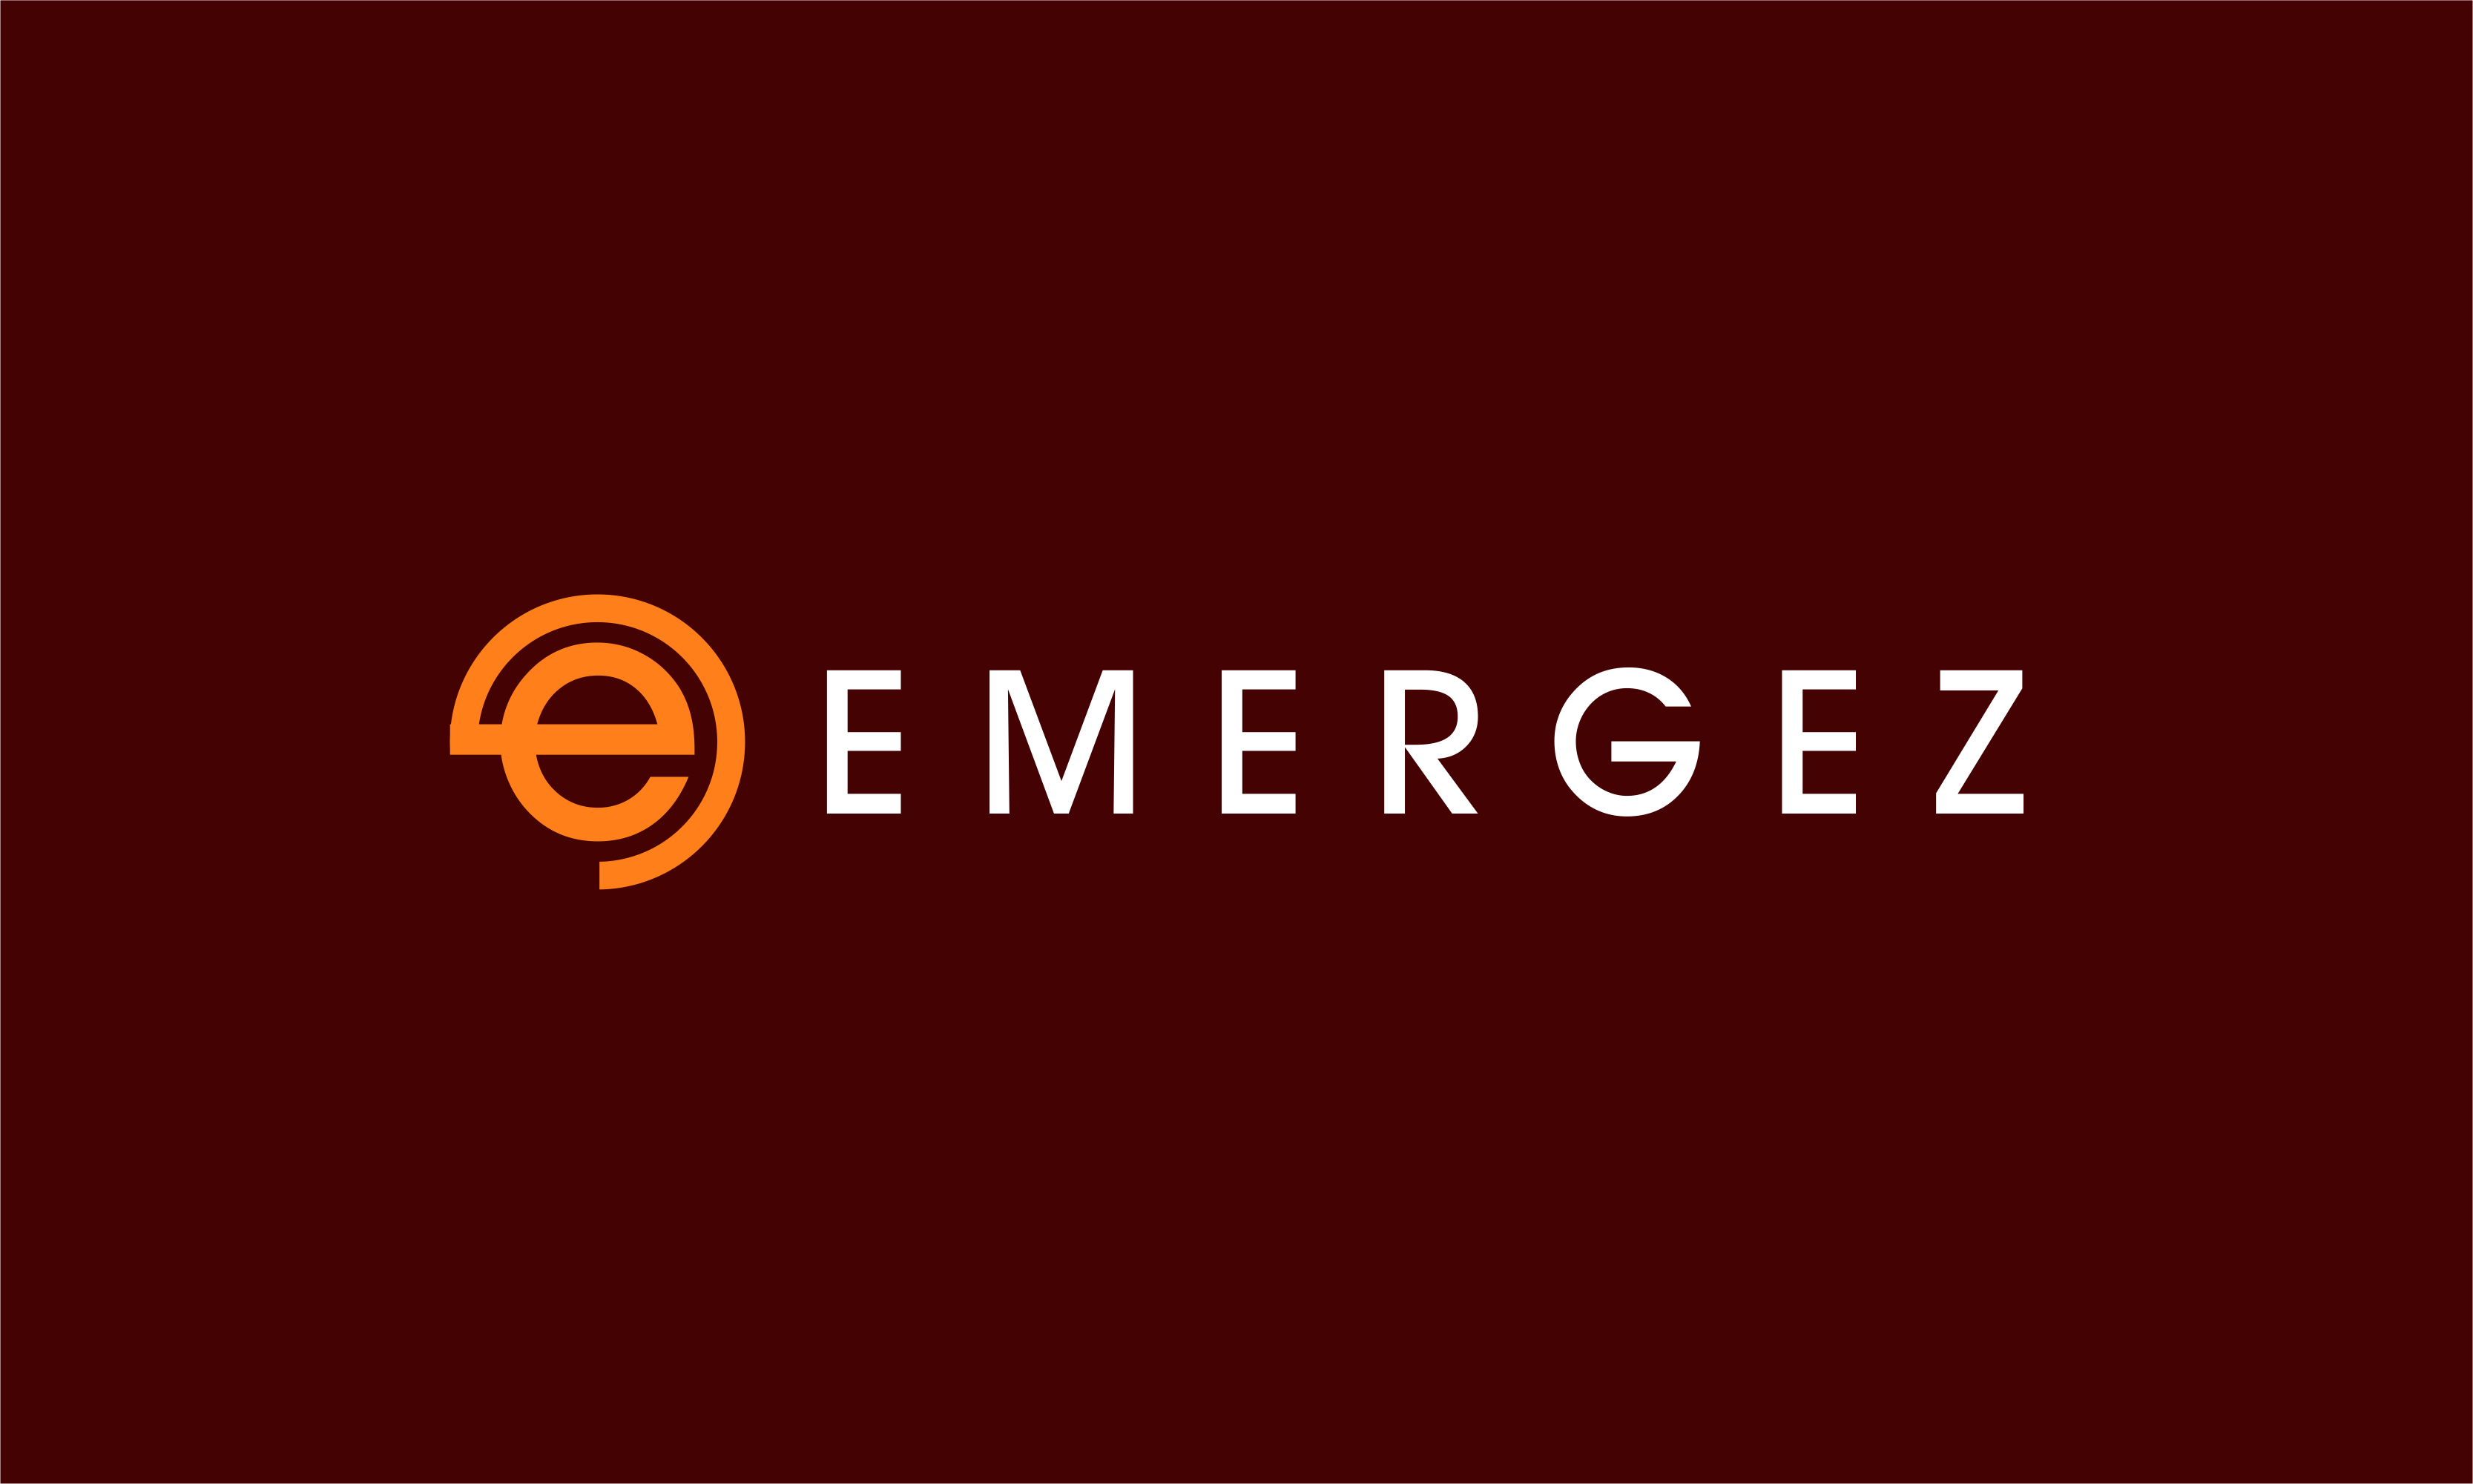 Emergez